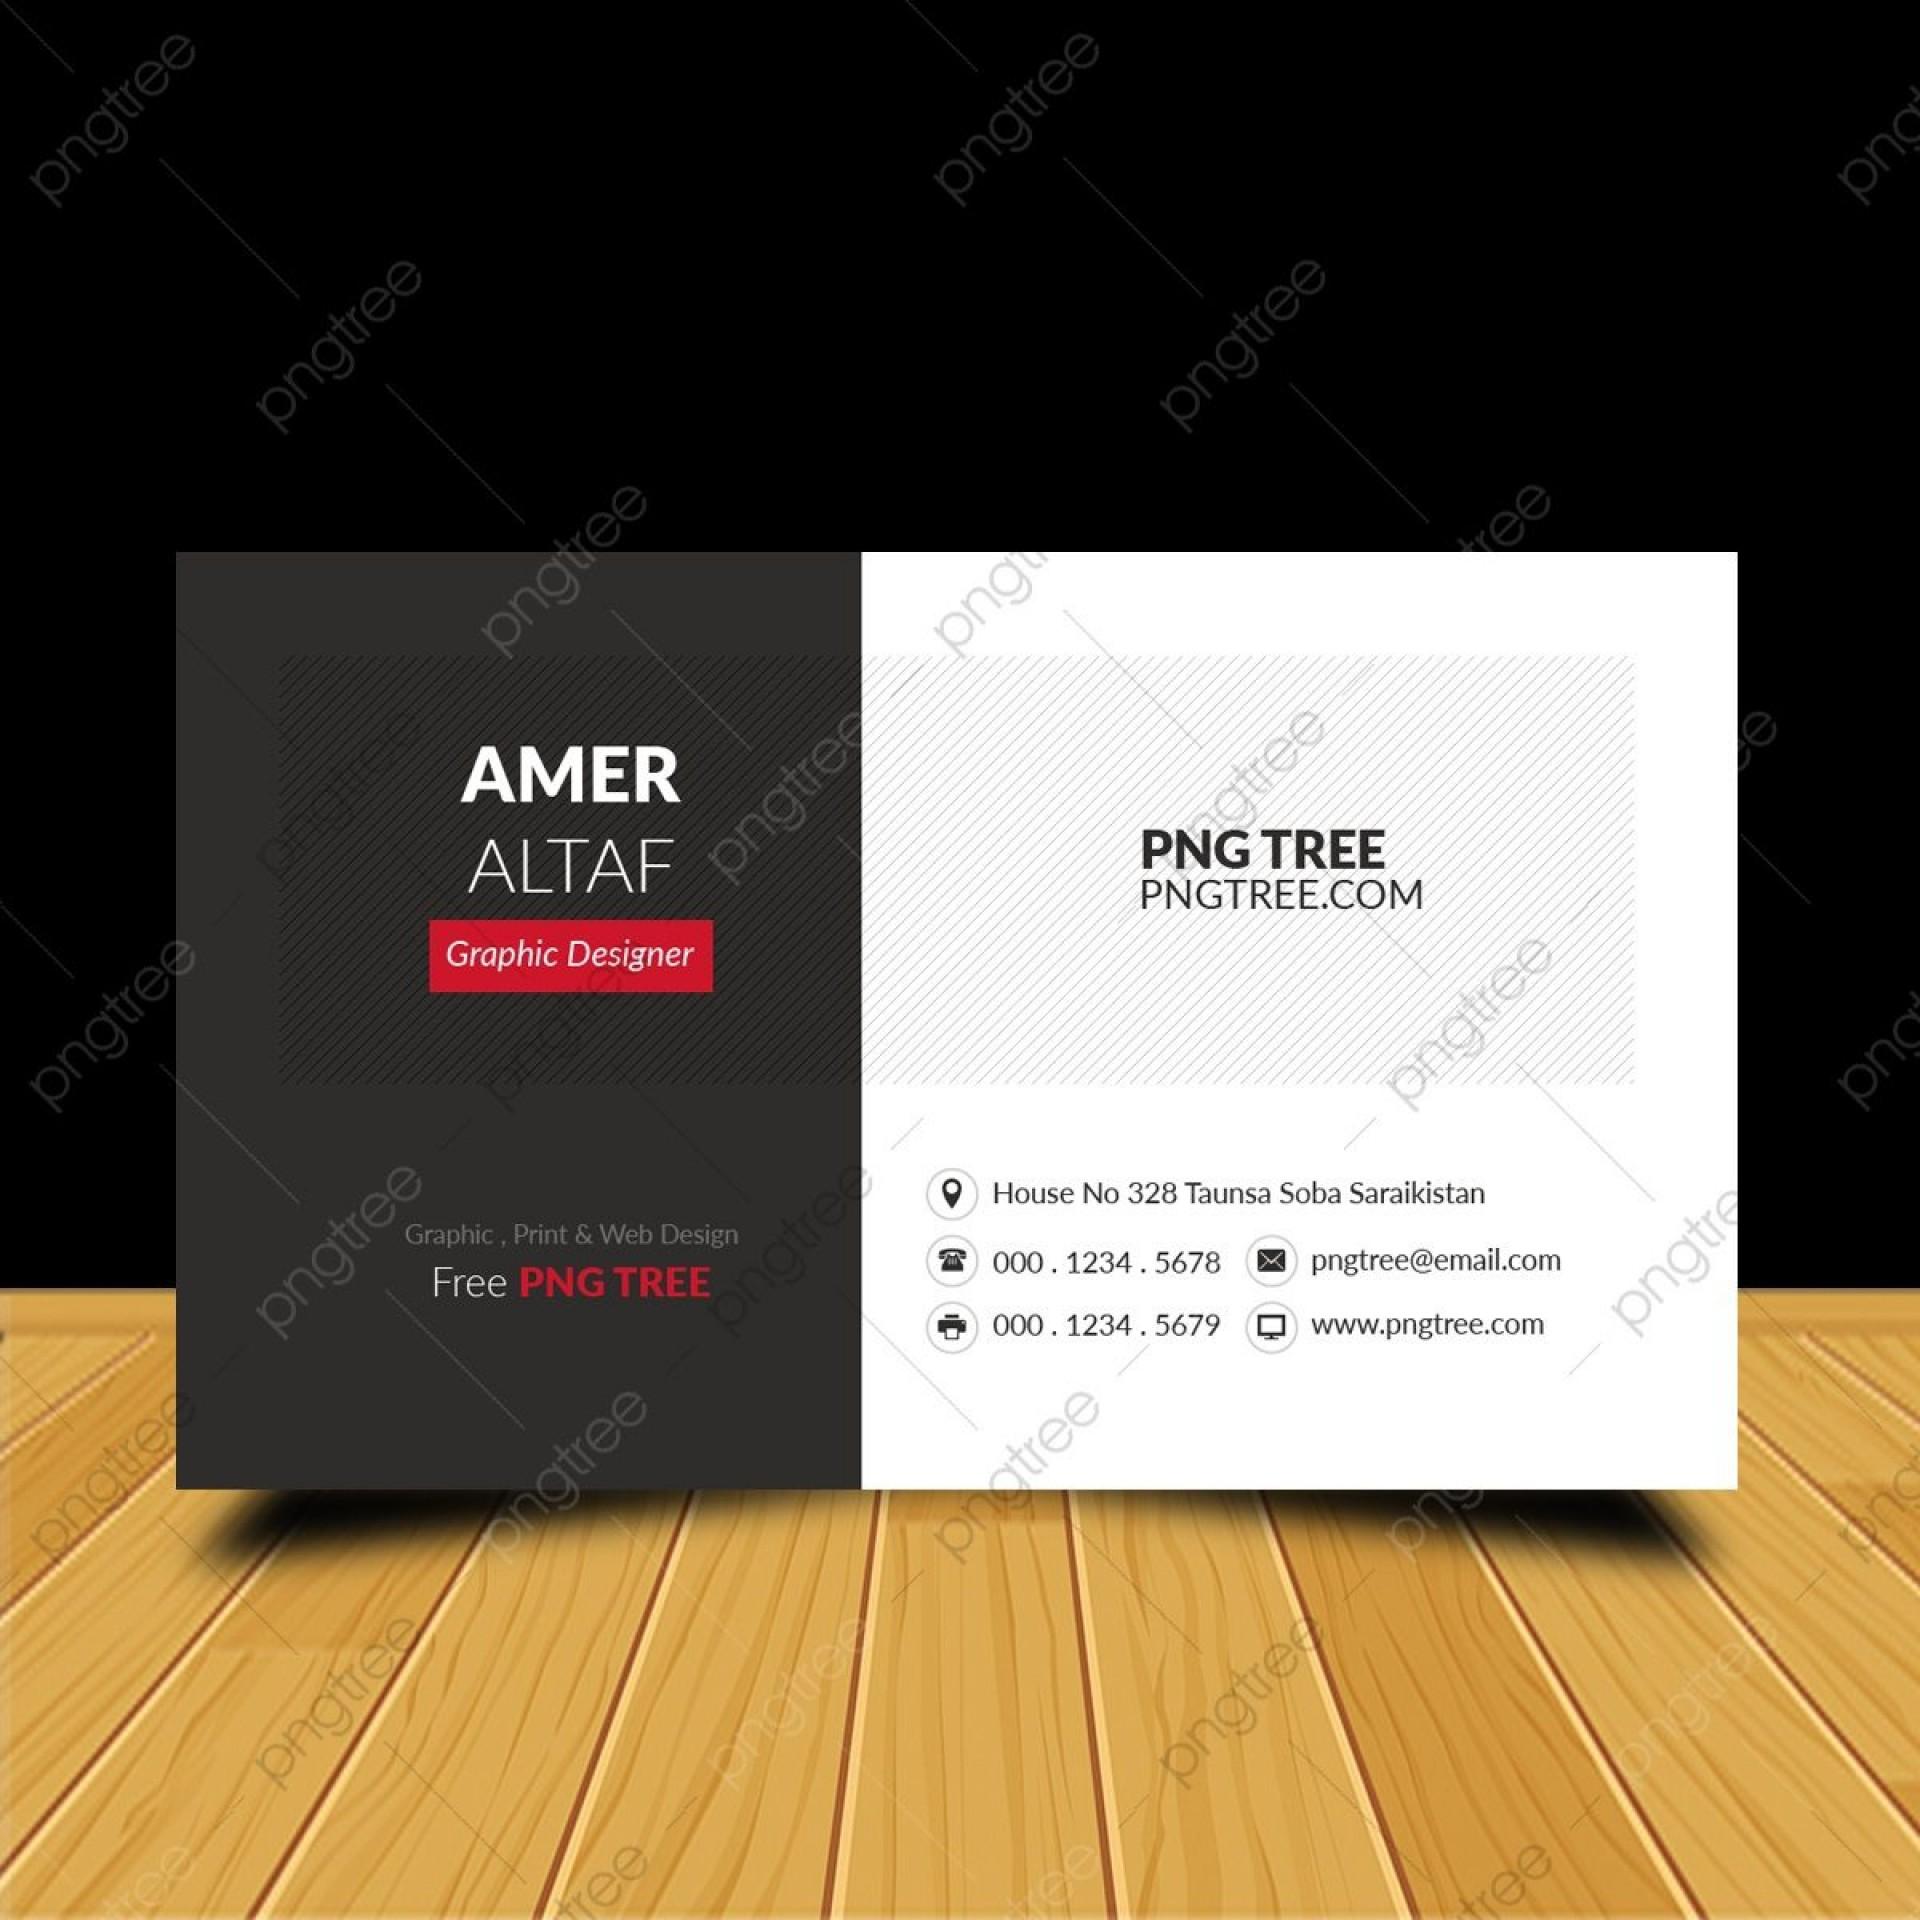 008 Sensational Simple Visiting Card Design Psd File Free Download Highest Quality 1920